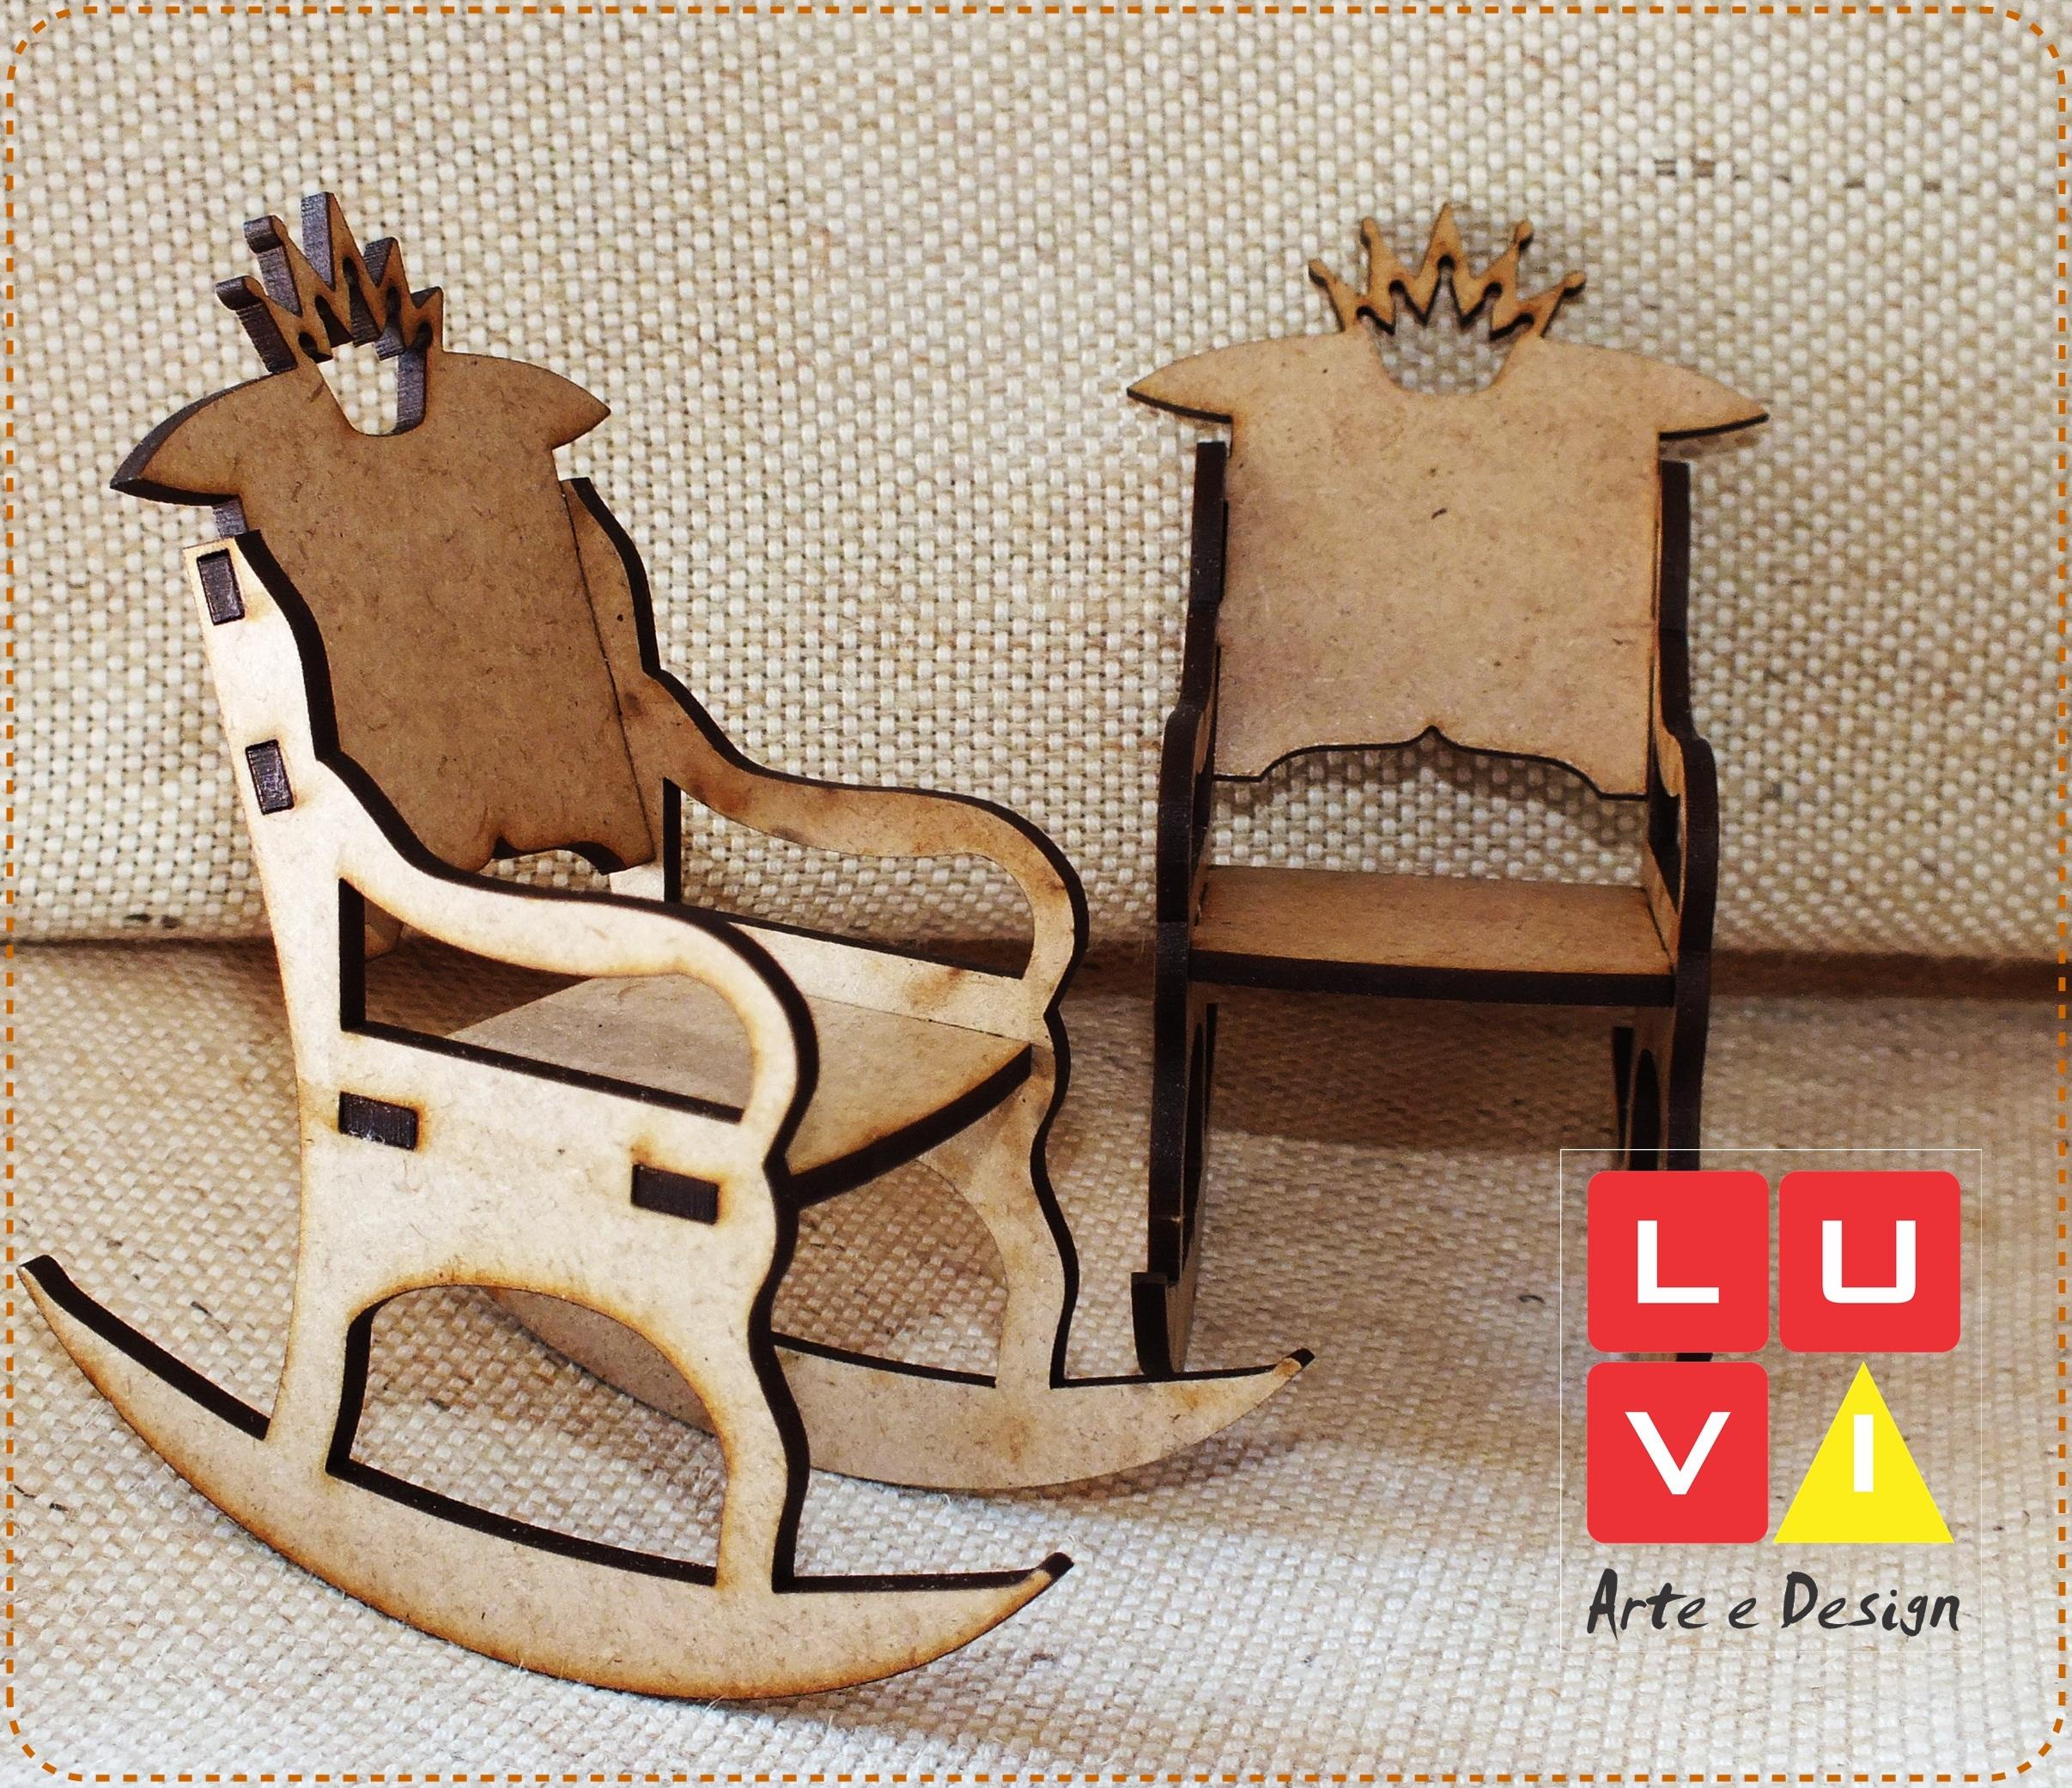 cadeira de balanco real cadeira de balanco real cadeira de balanco  #C7BB04 2413x2082